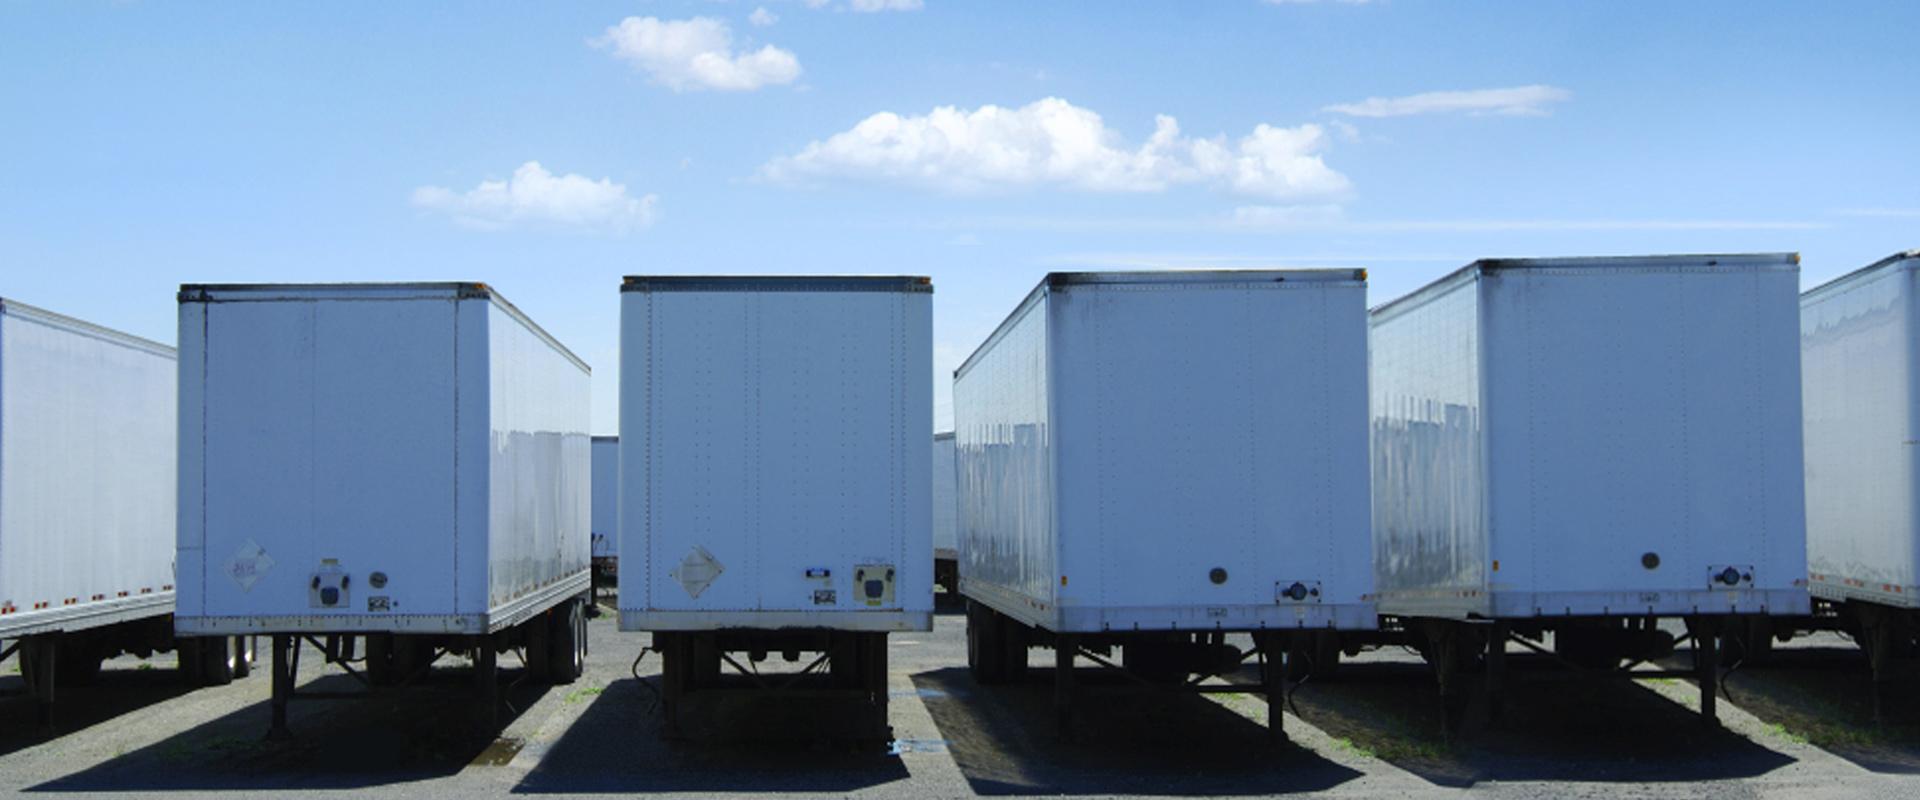 Truck & Trailer Parking